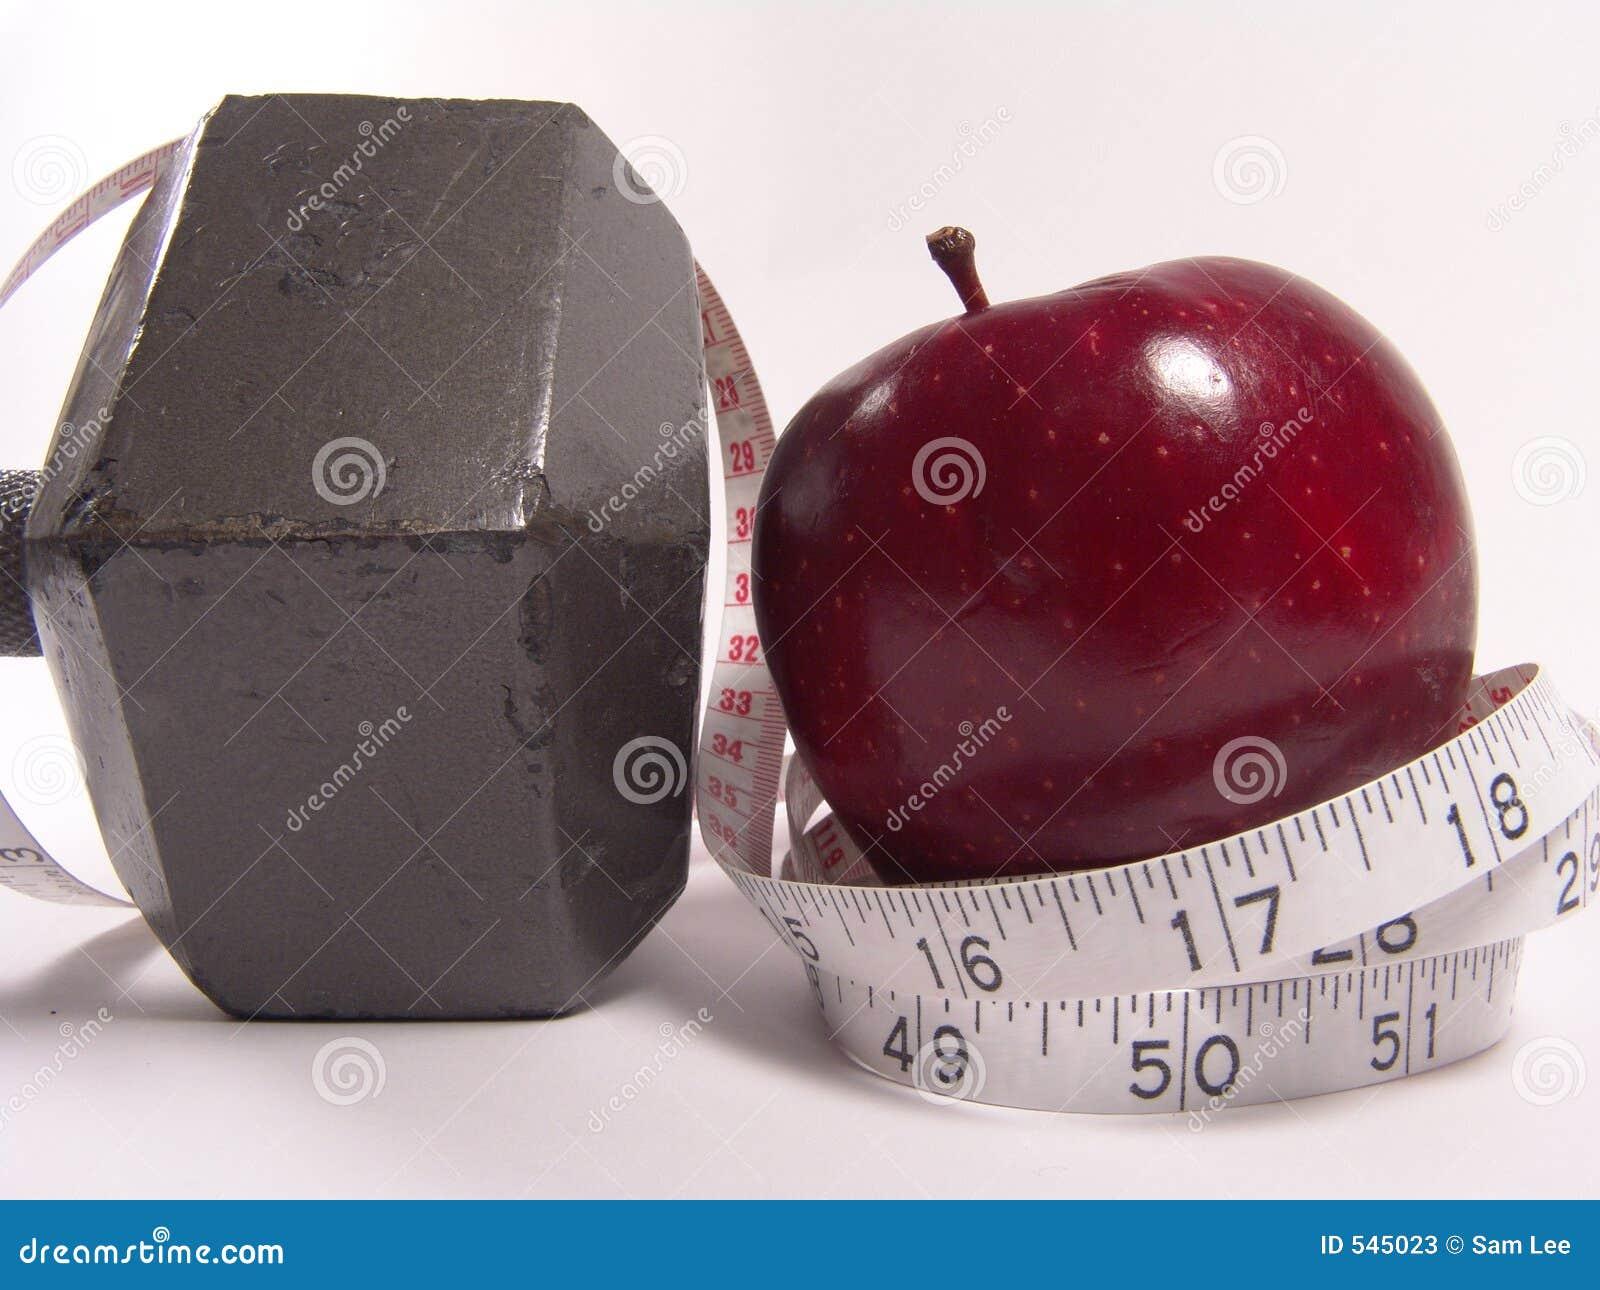 Download 健康规定 库存图片. 图片 包括有 自由, 自然, 执行, 卡路里, 英寸, 健康, 评定, 糖尿病, 营养 - 545023